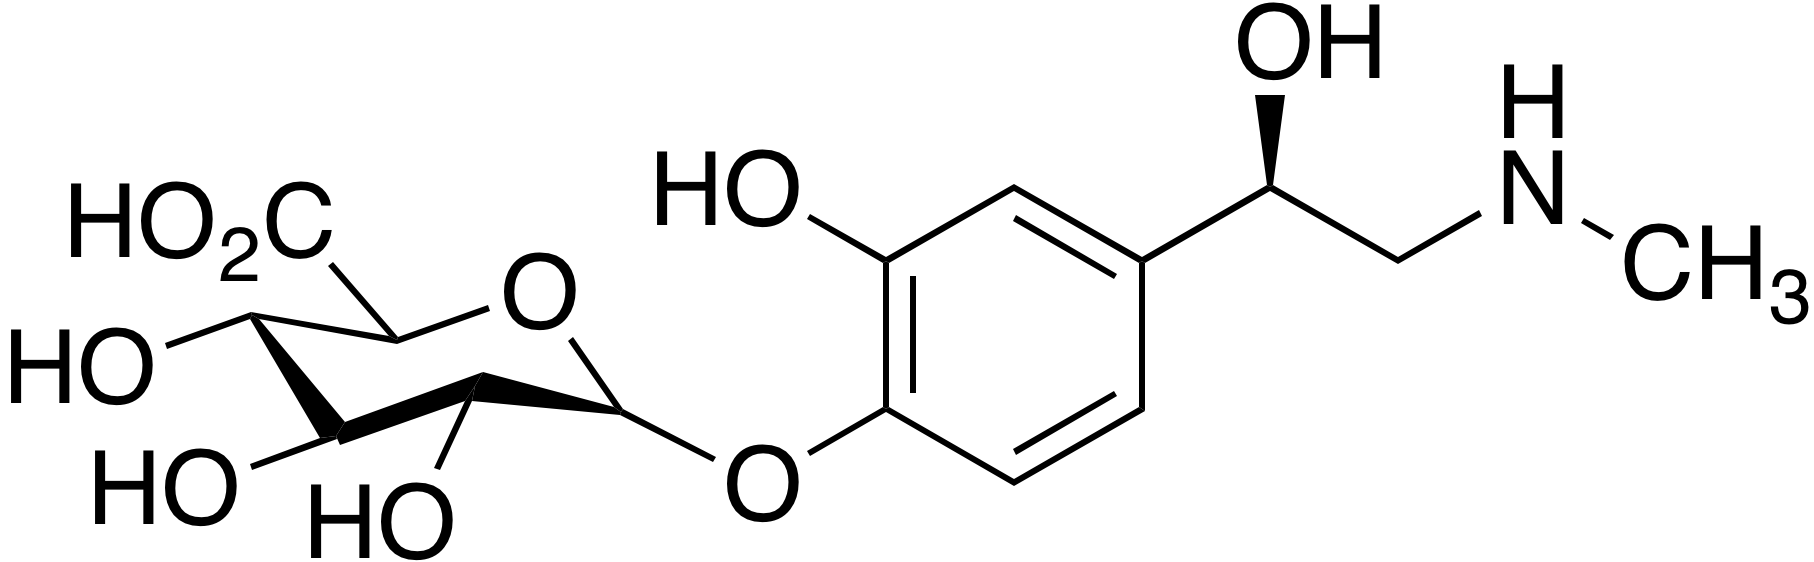 Epinephrine glucuronide